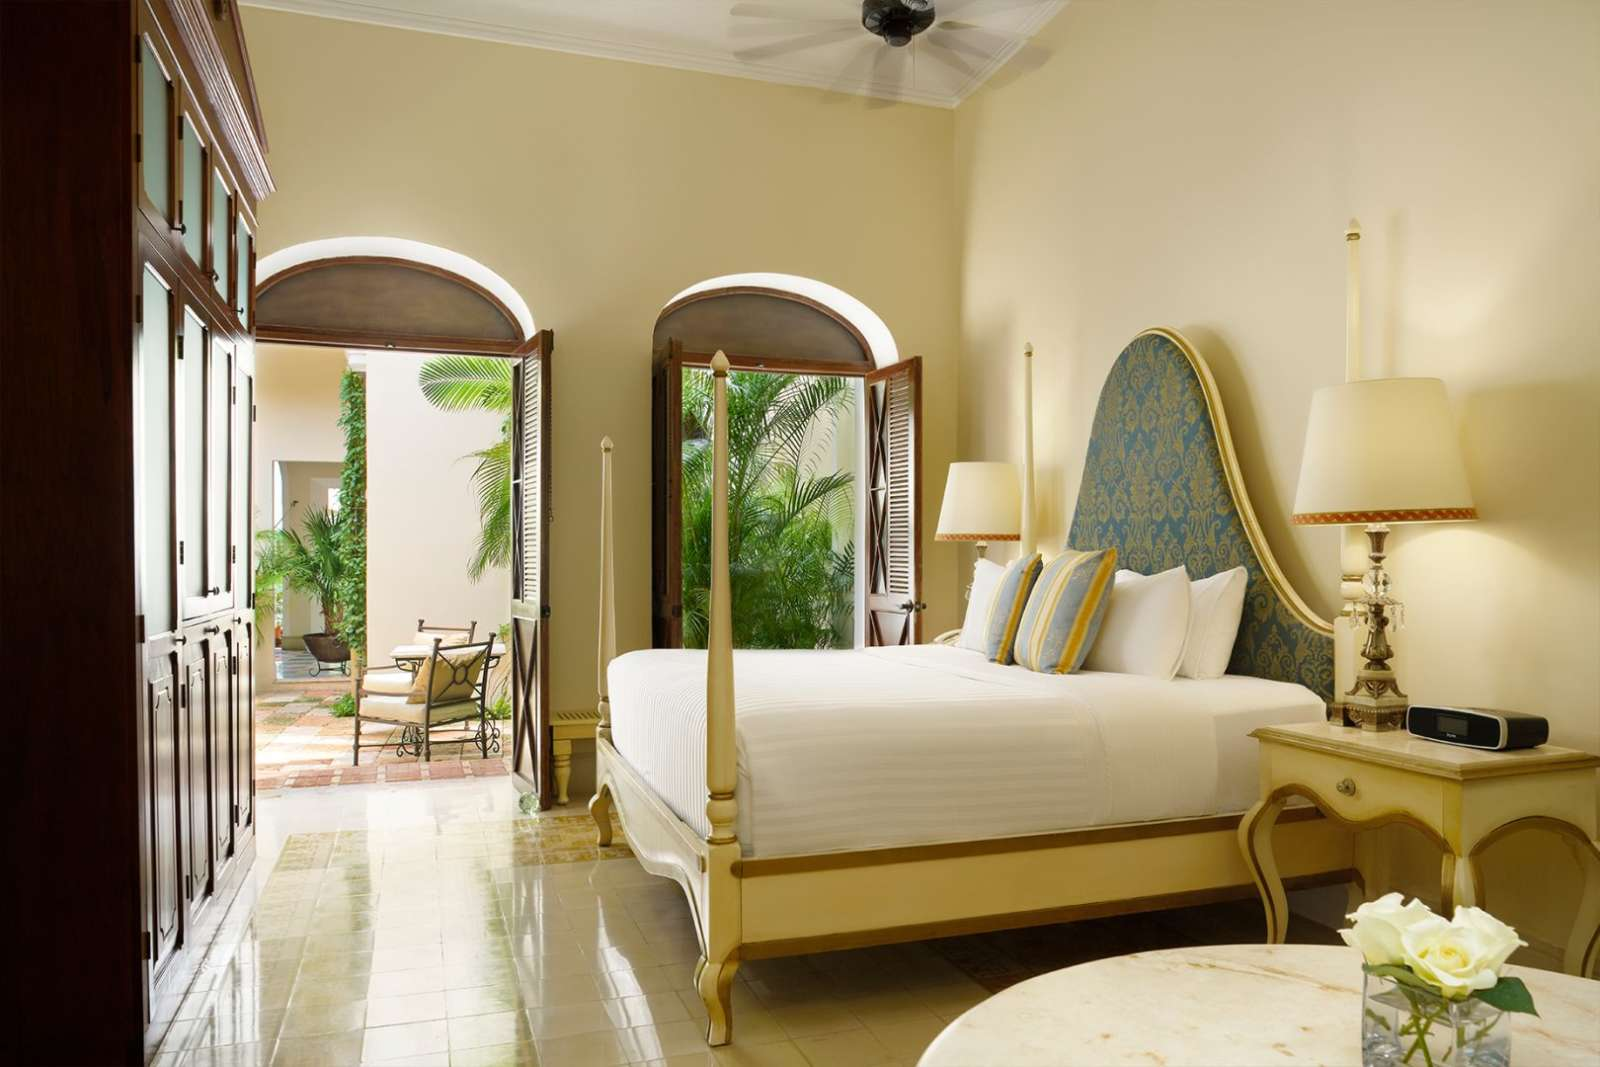 Bedroom at Casa Lecanda in Merida